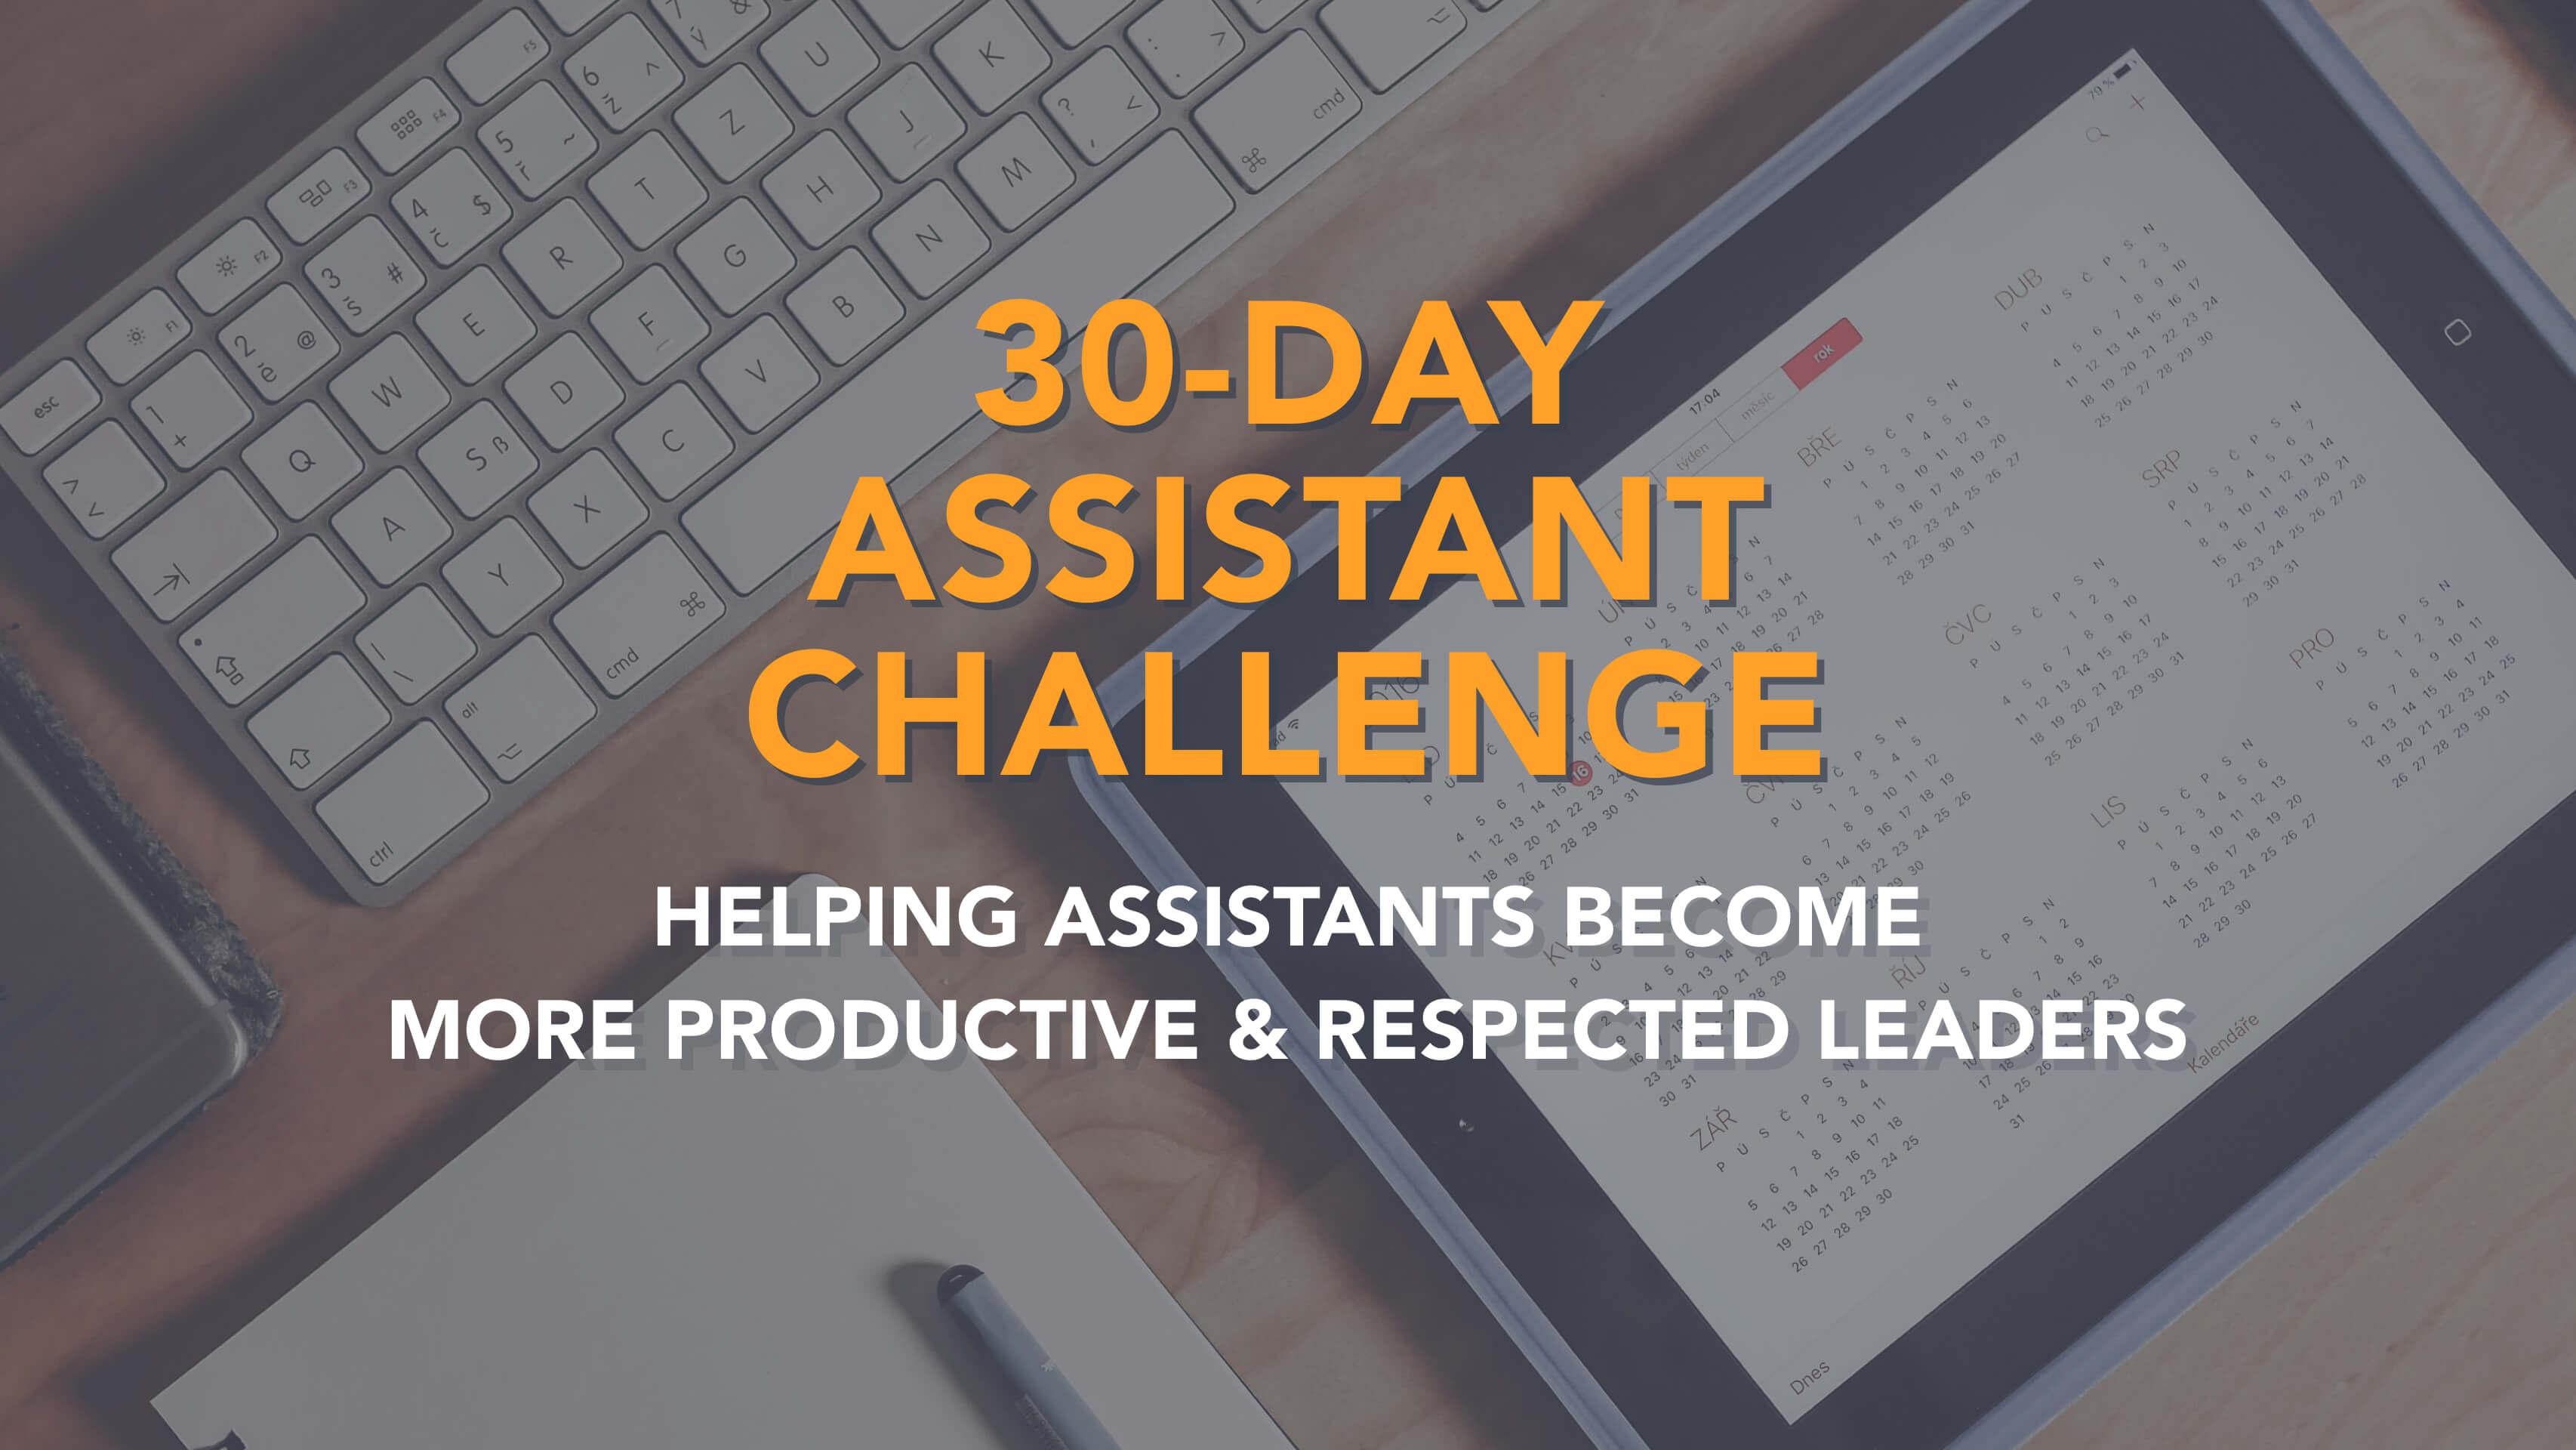 Assistant Challenge Details